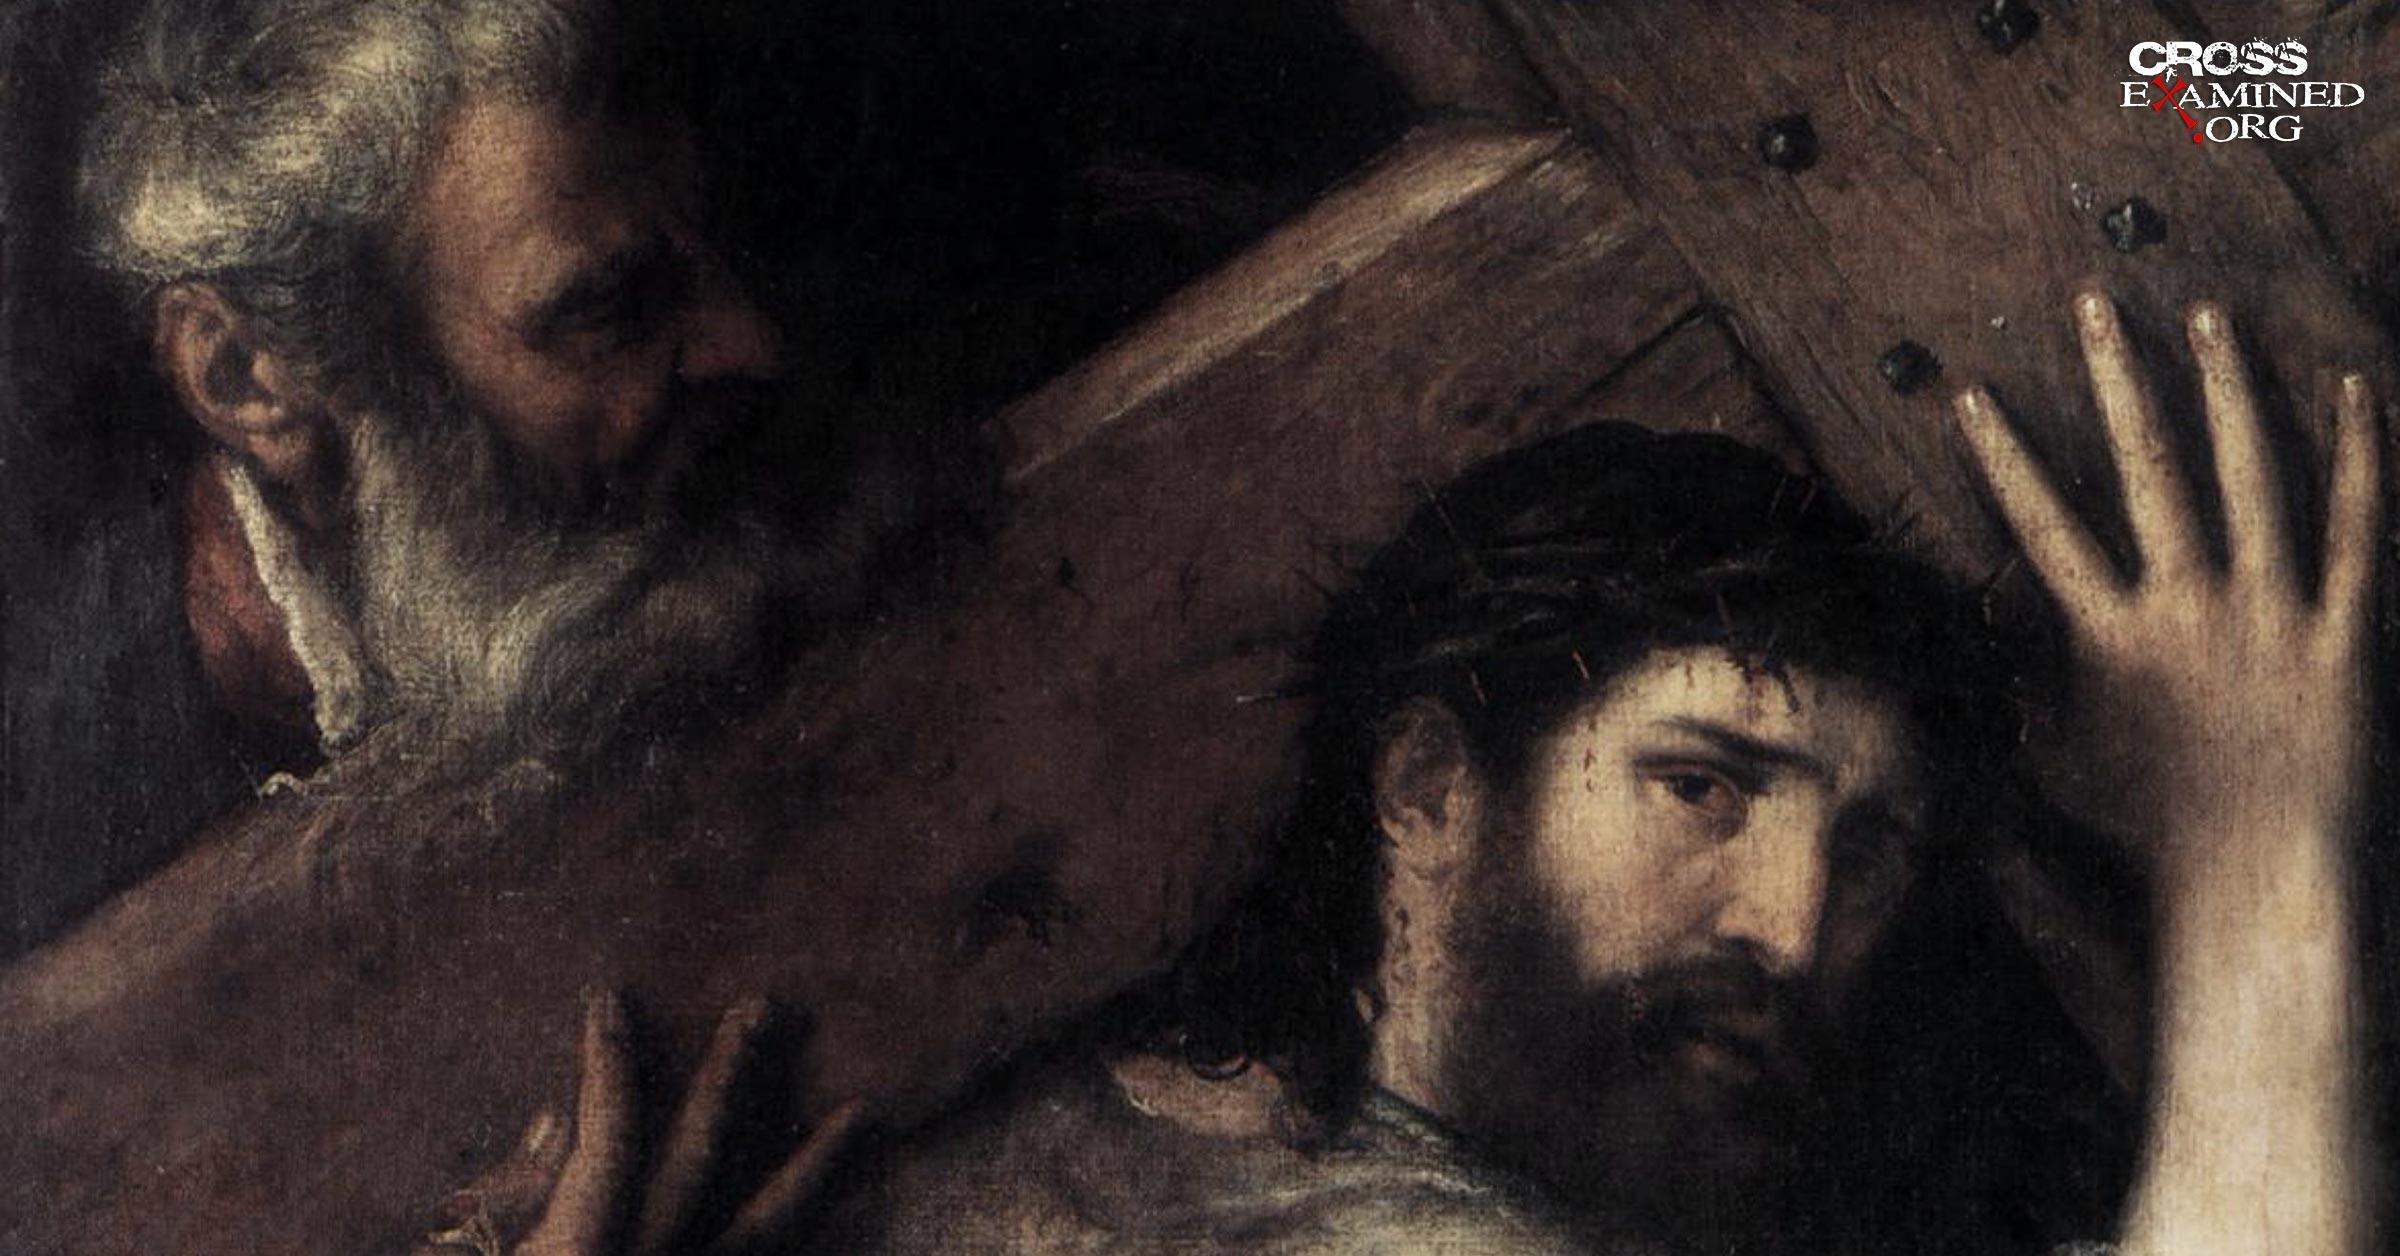 Simon of Cyrene, Cleopas, and the Eyewitness Testimony of the Gospels